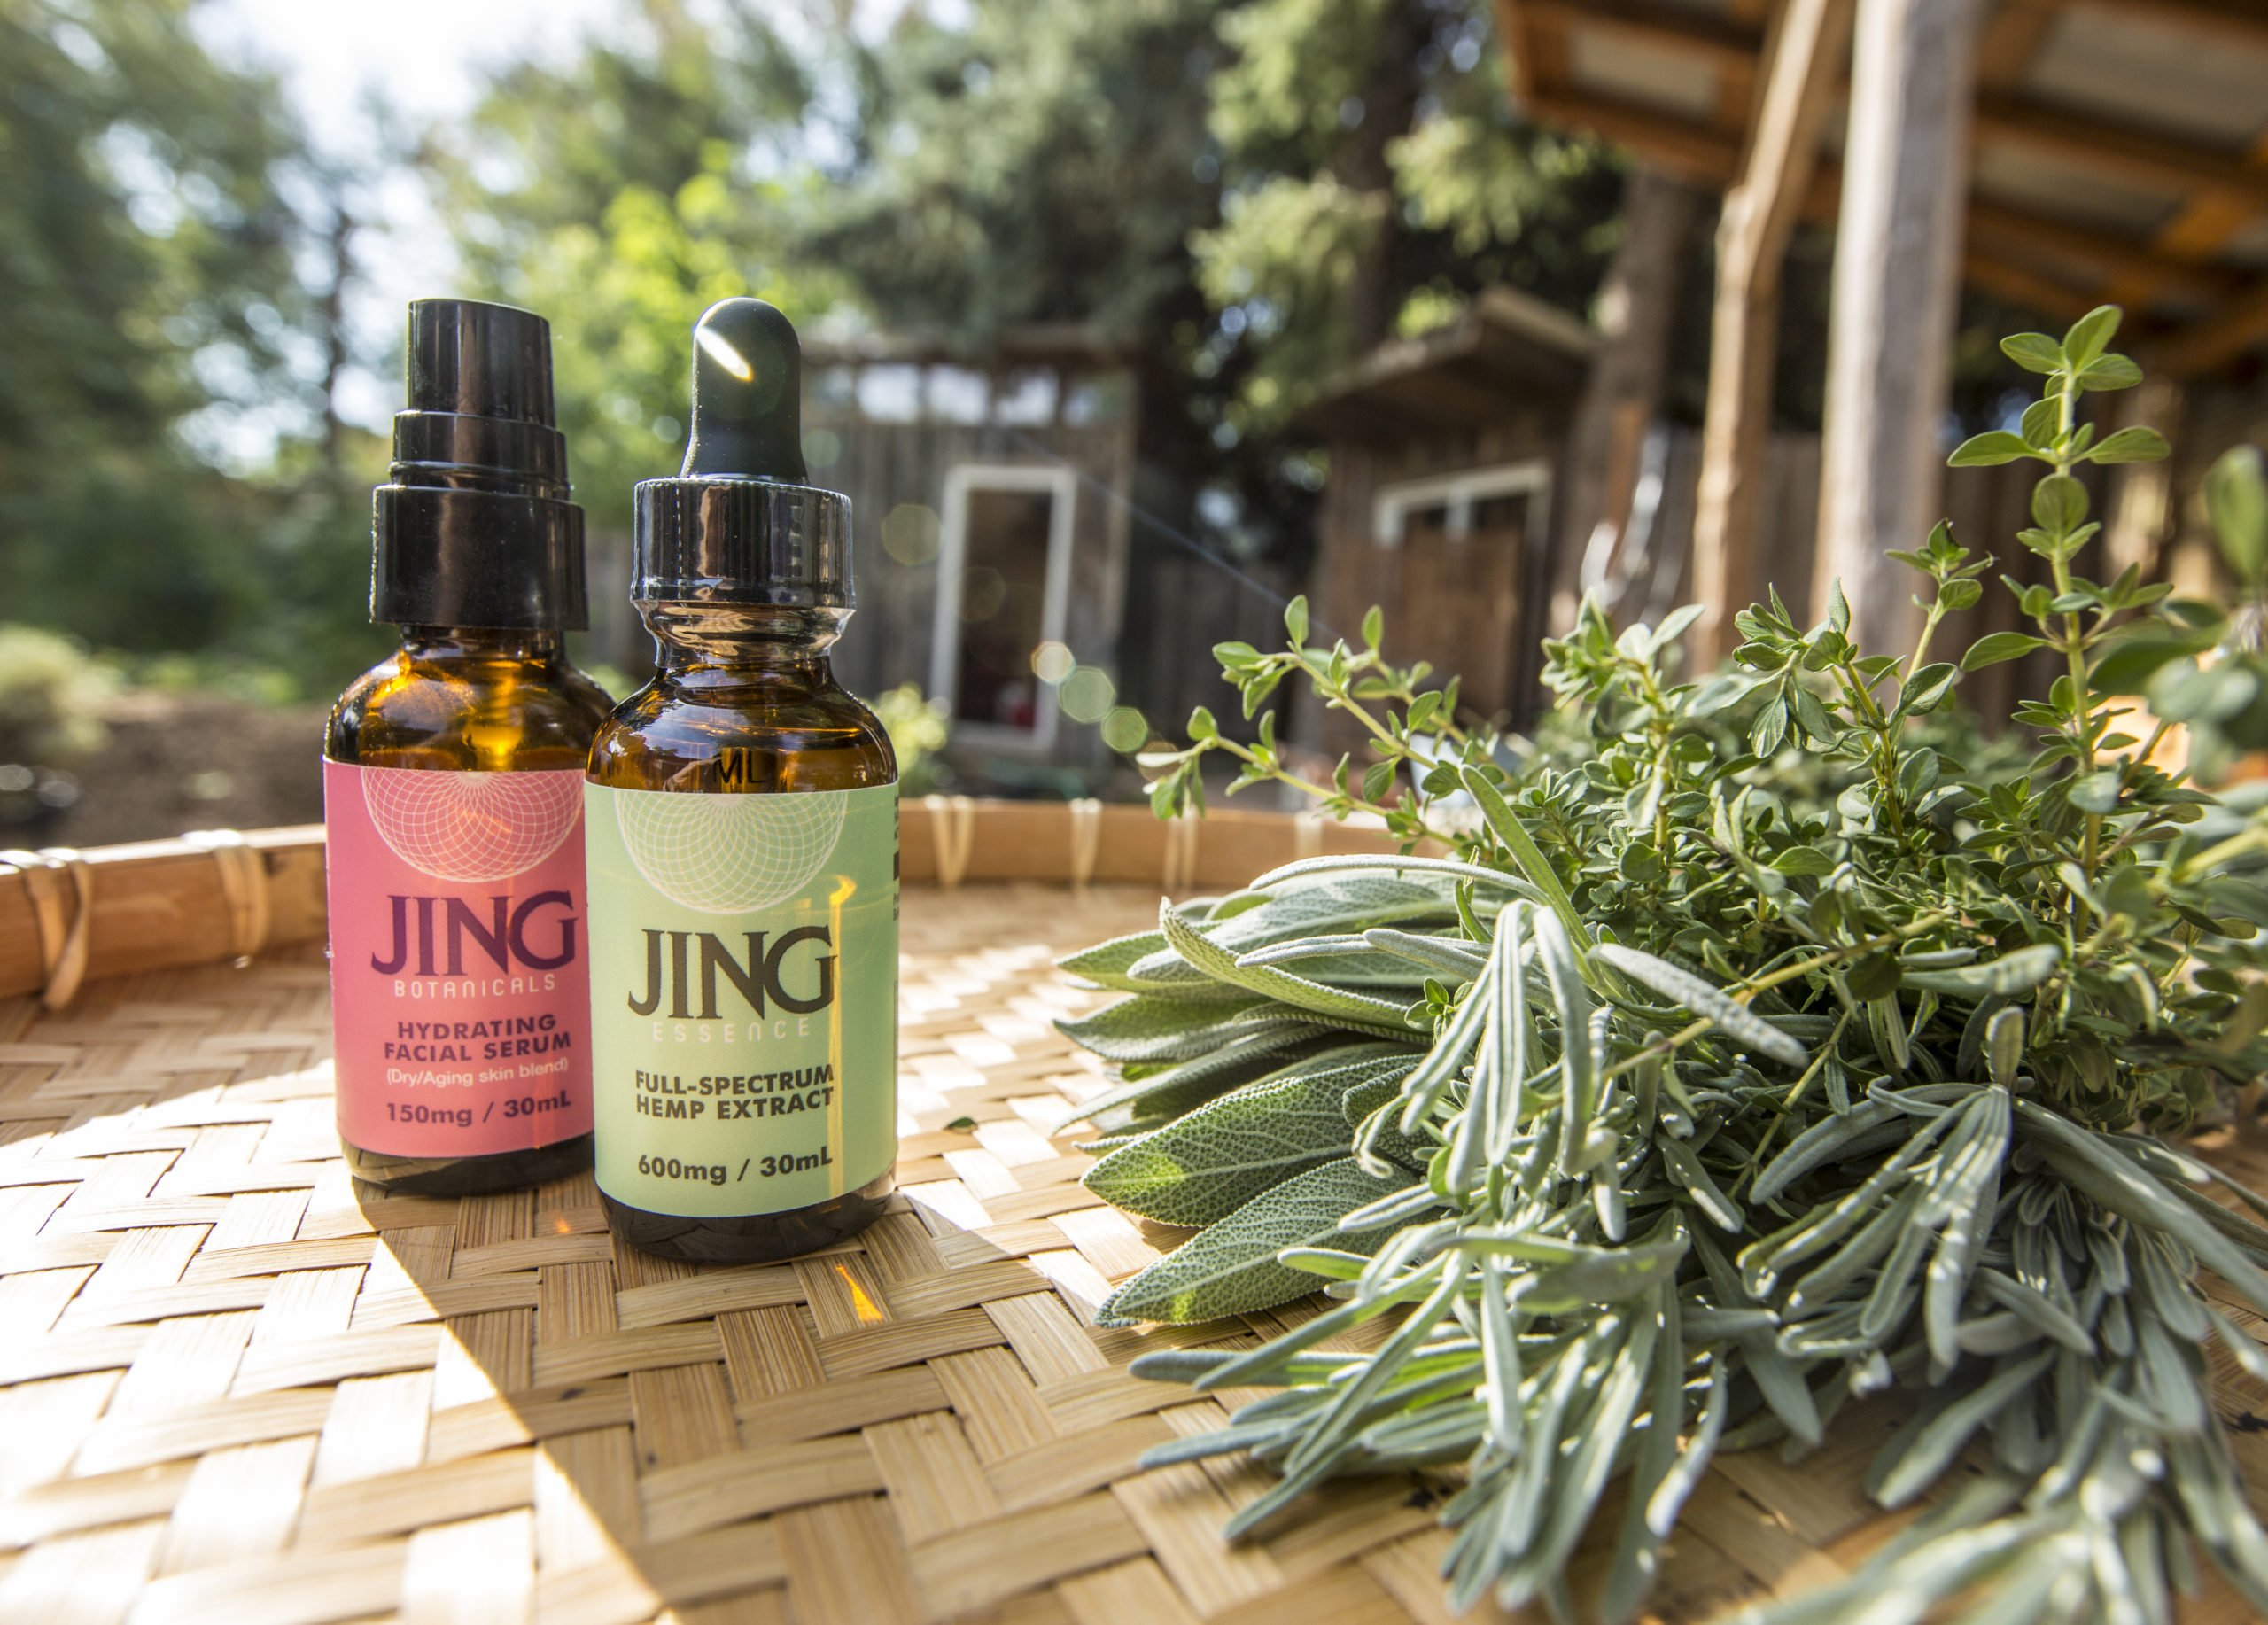 About Jing Botanicals